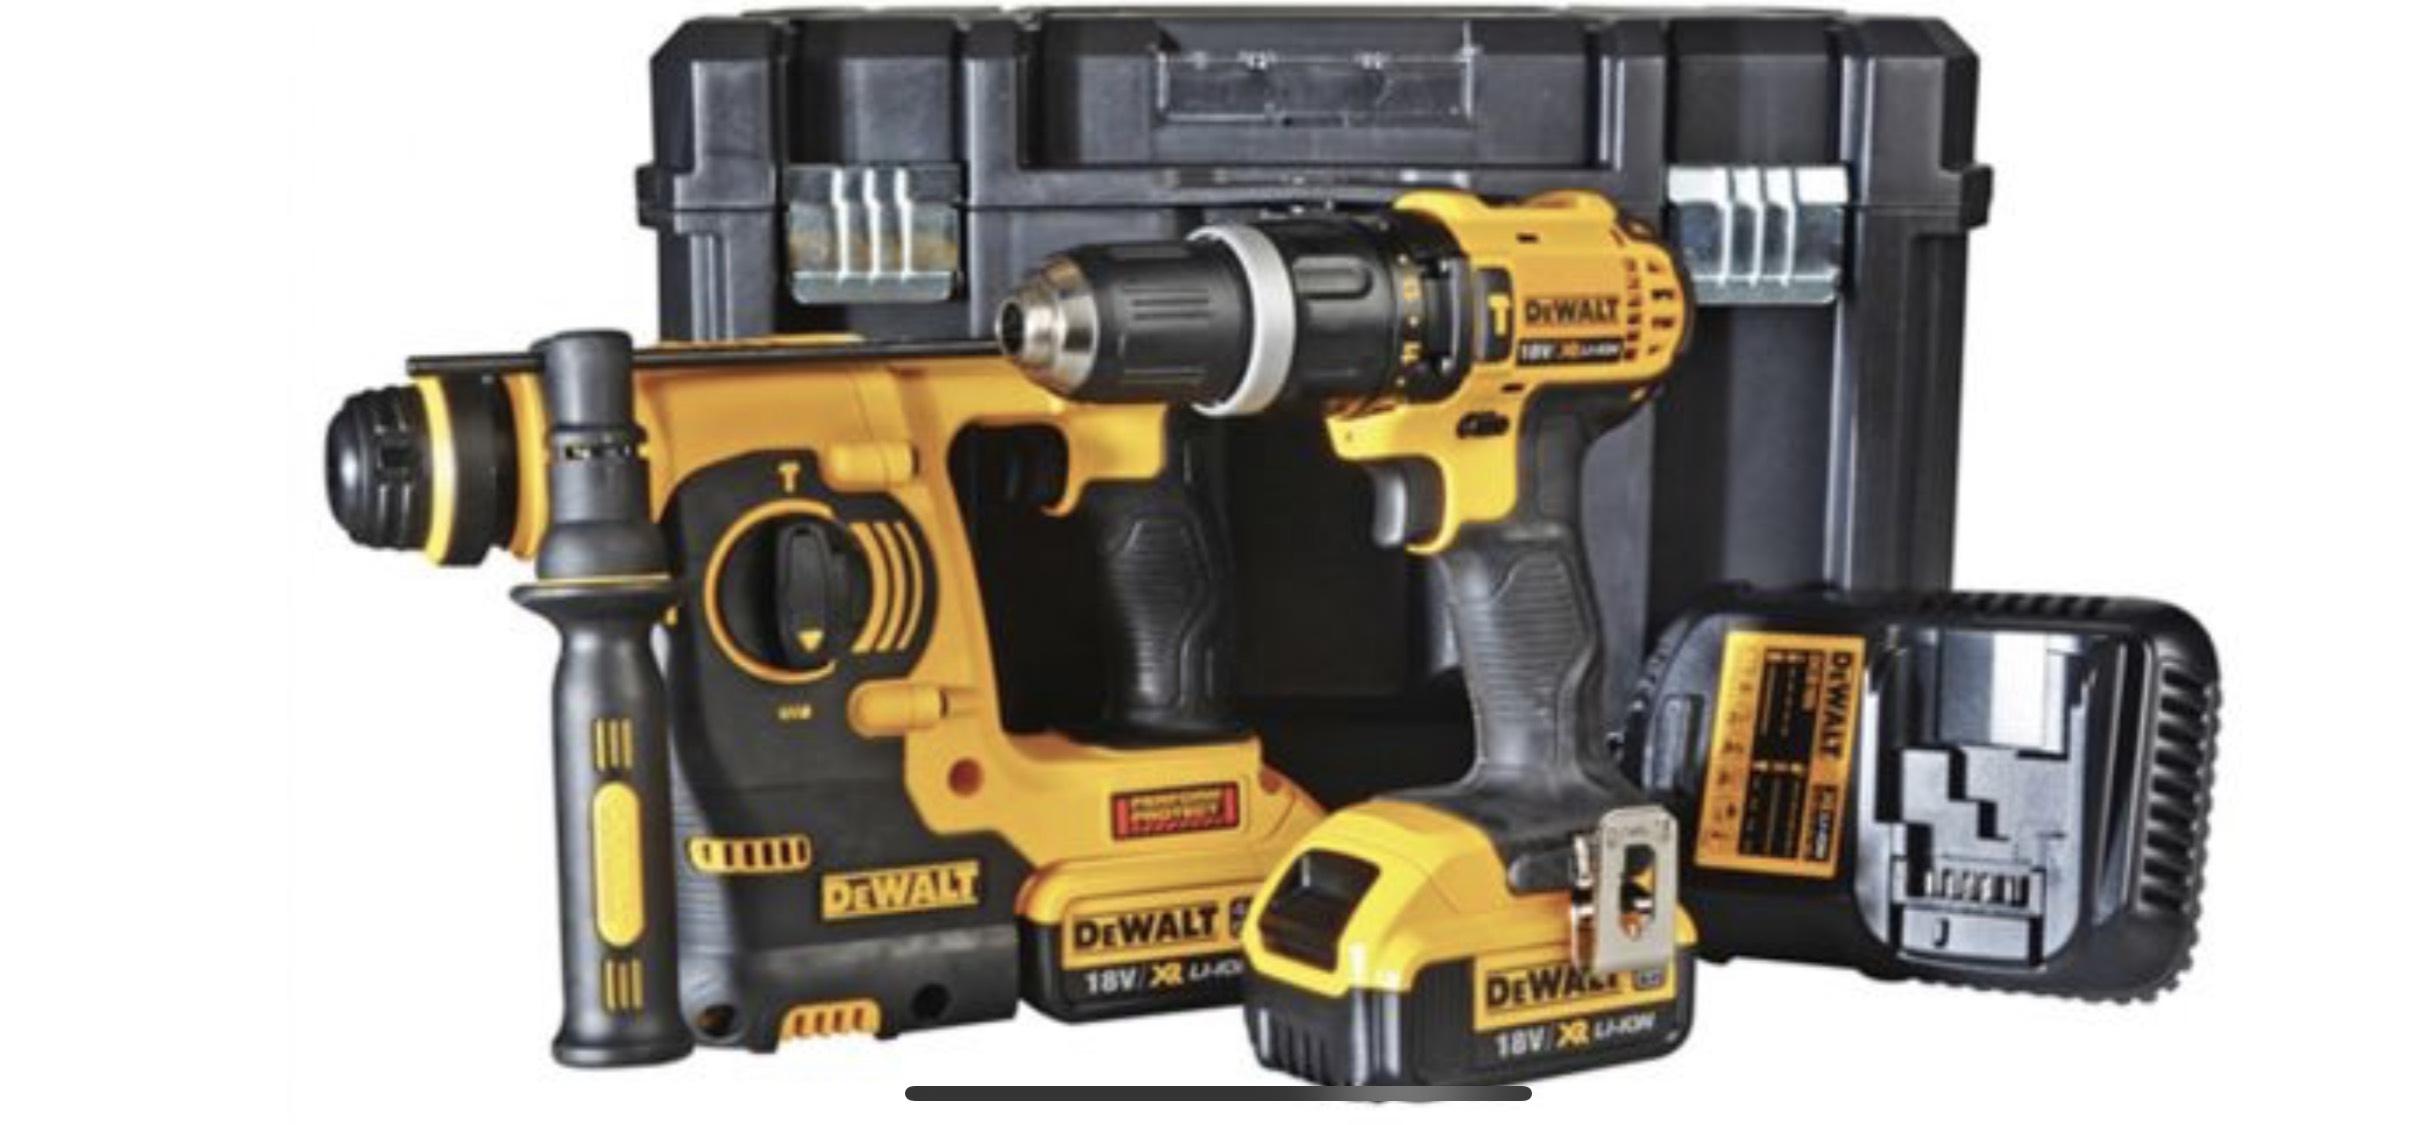 Dewalt SDS & Hammer Drill Driver Twin Pack £269.99 MTS